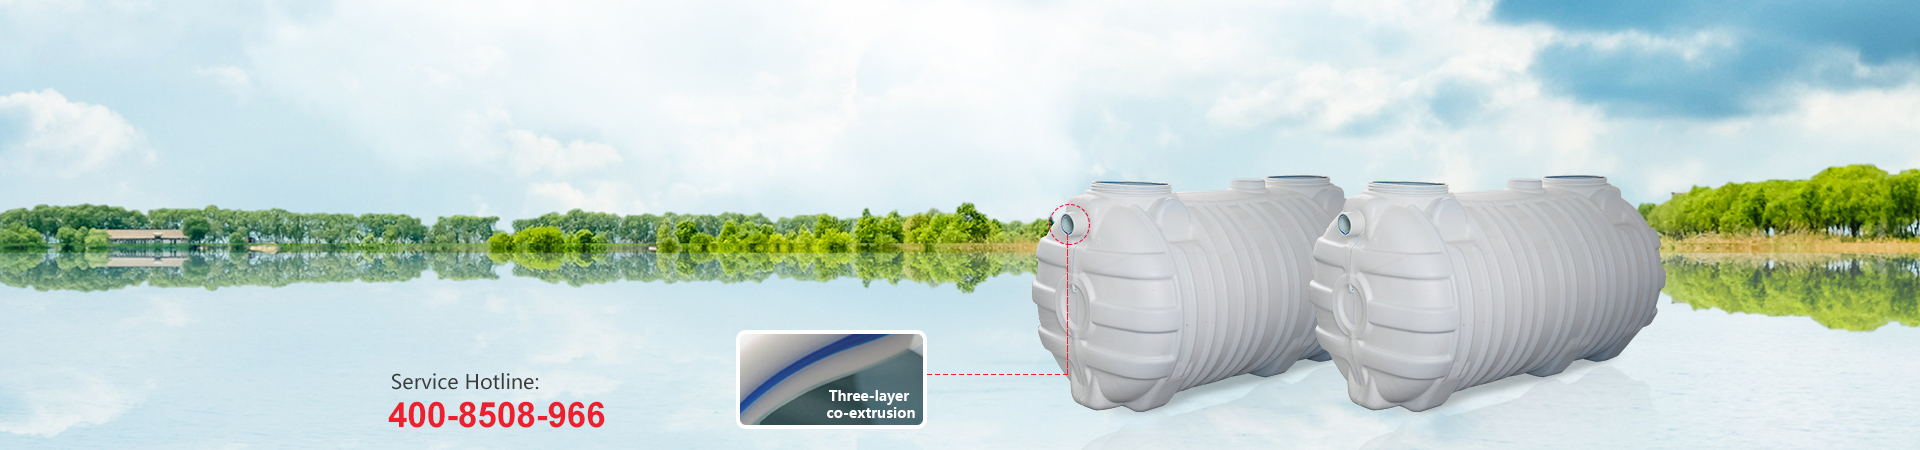 Roll plastic septic tank